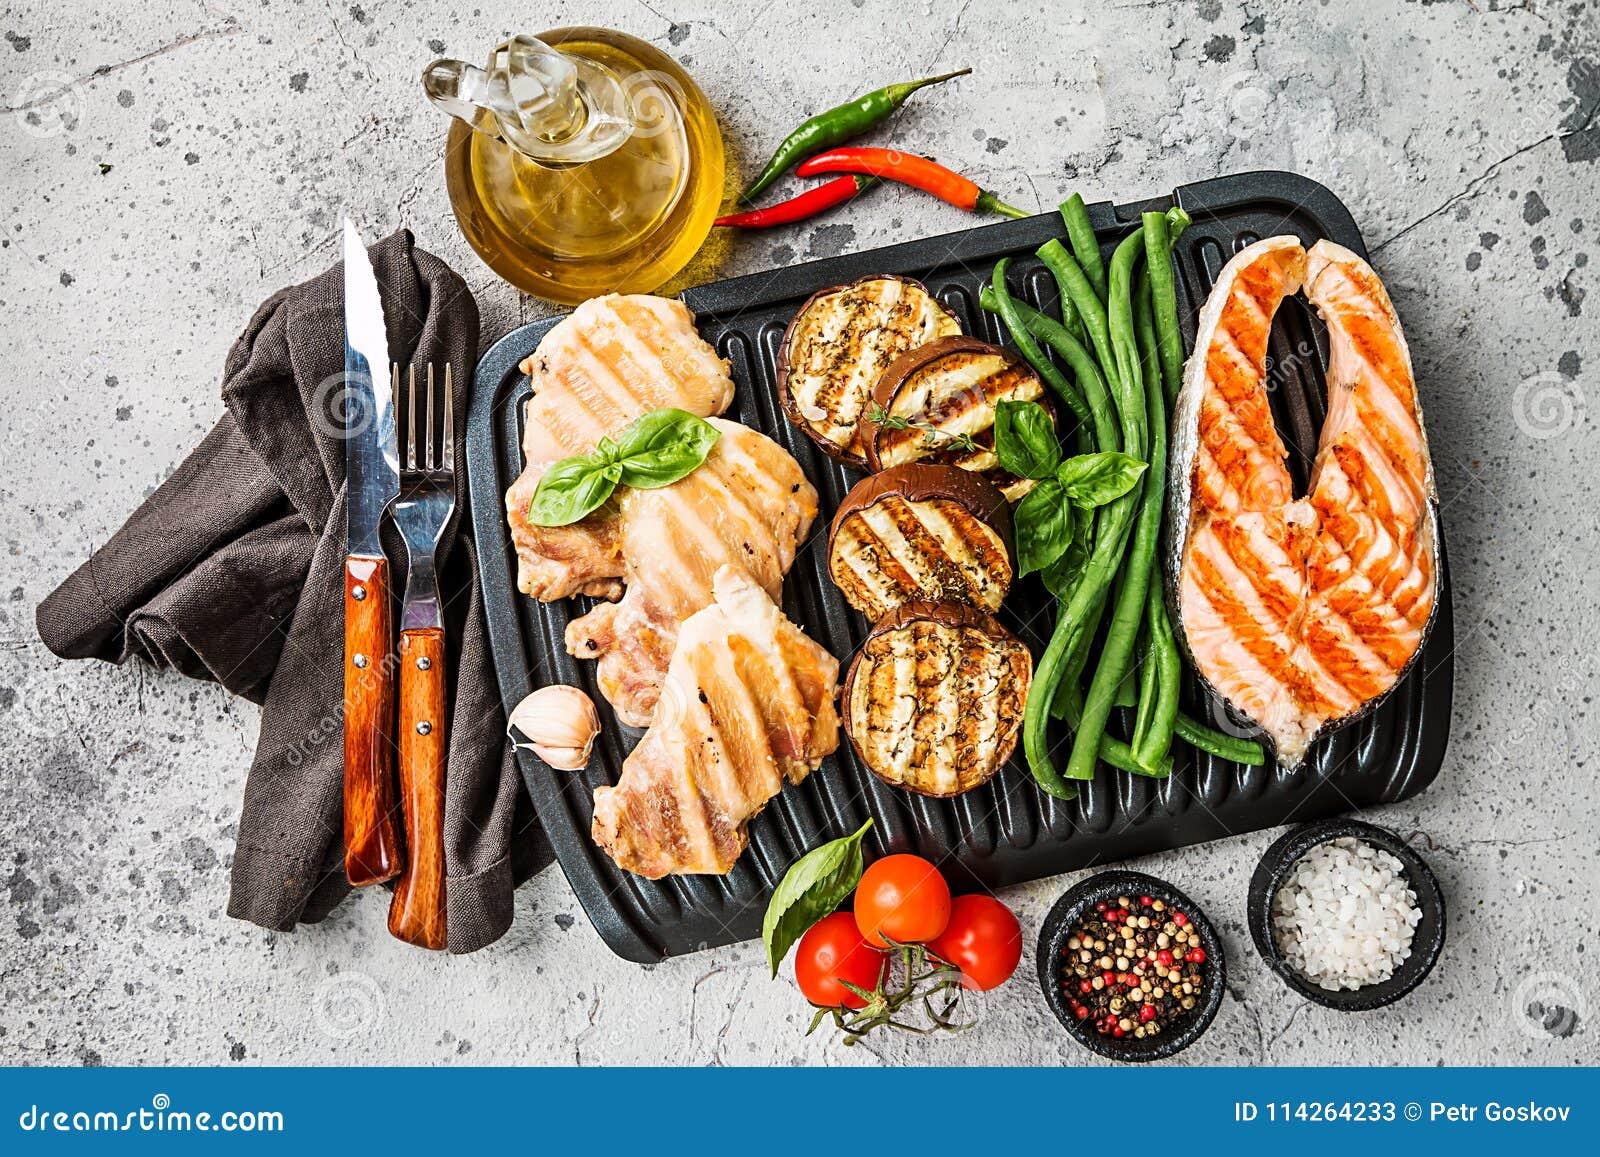 Healthy grill food